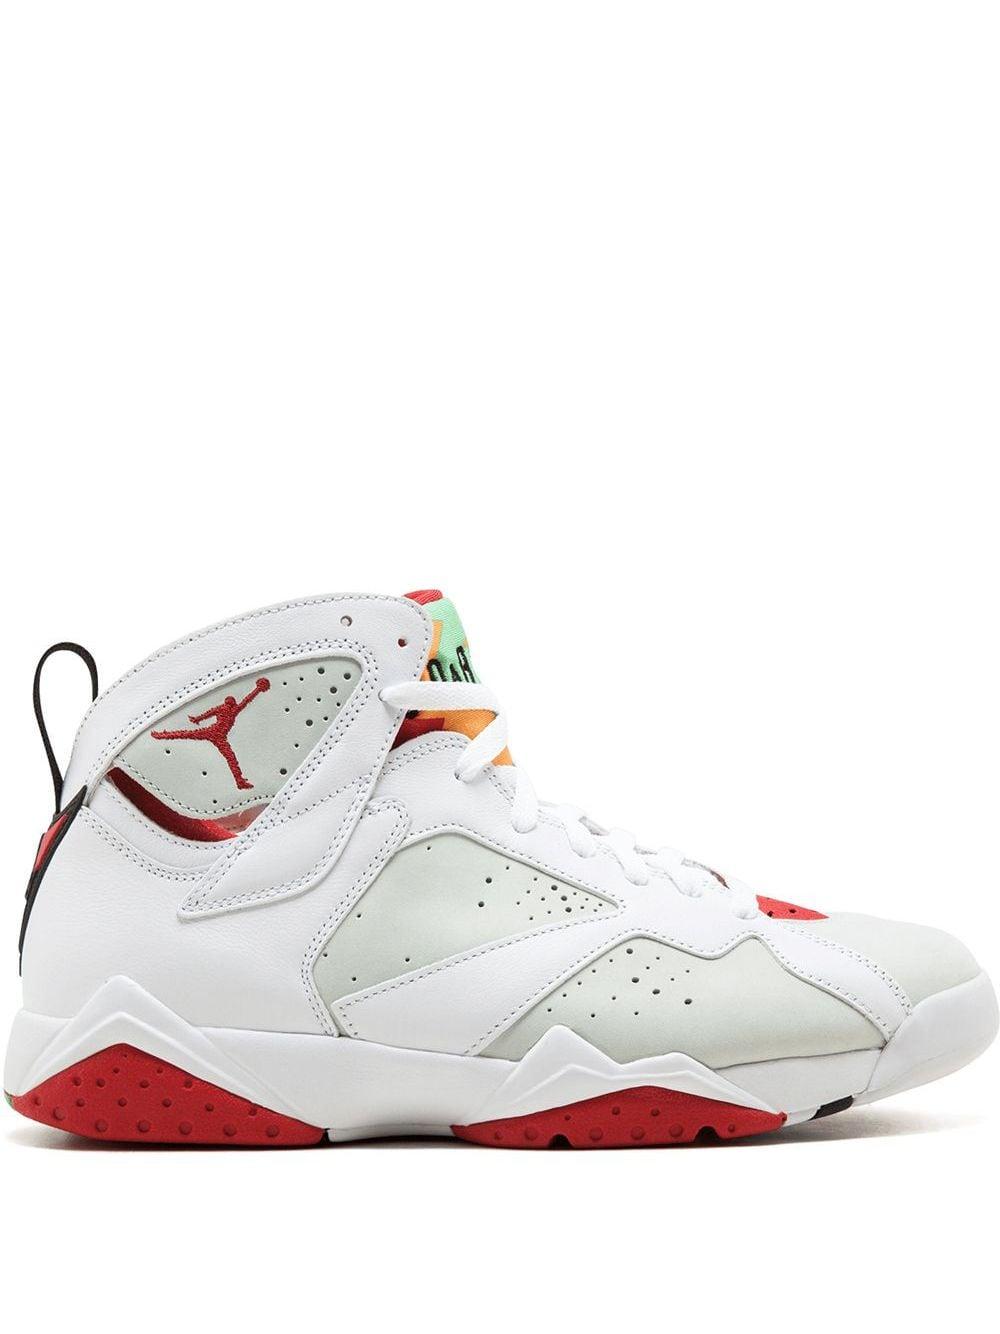 check out c149a fb14b ... coupon for jordan air jordan 7 retro sneakers weiß von jordan eabc9  5f933